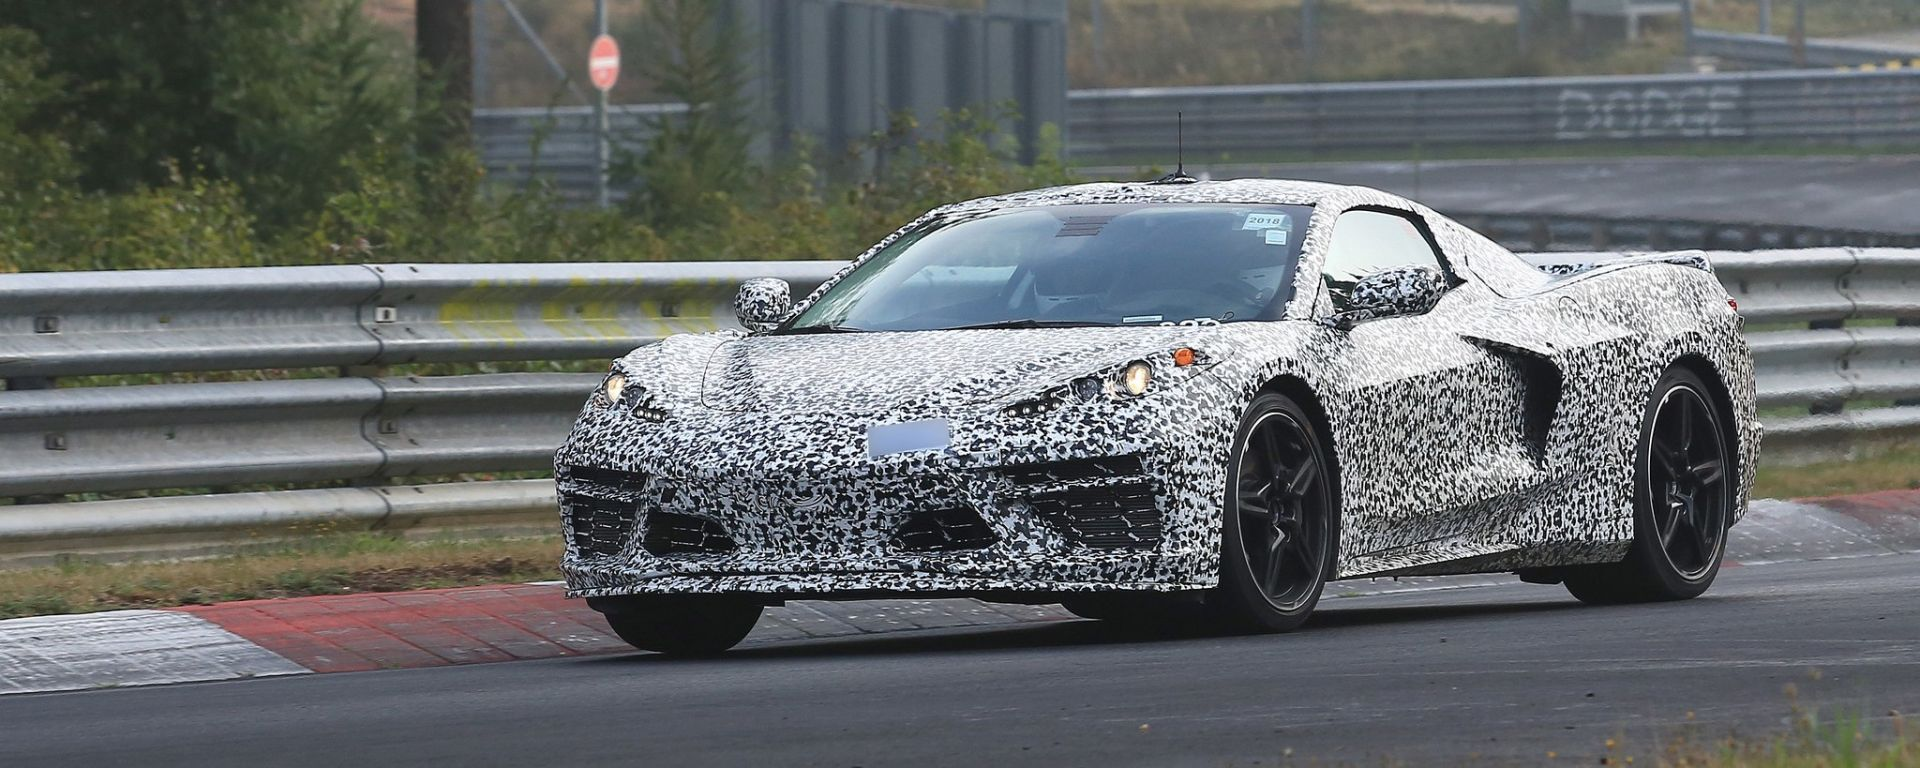 Corvette C8: ecco le nuove foto spy dal Nurburgring (video)